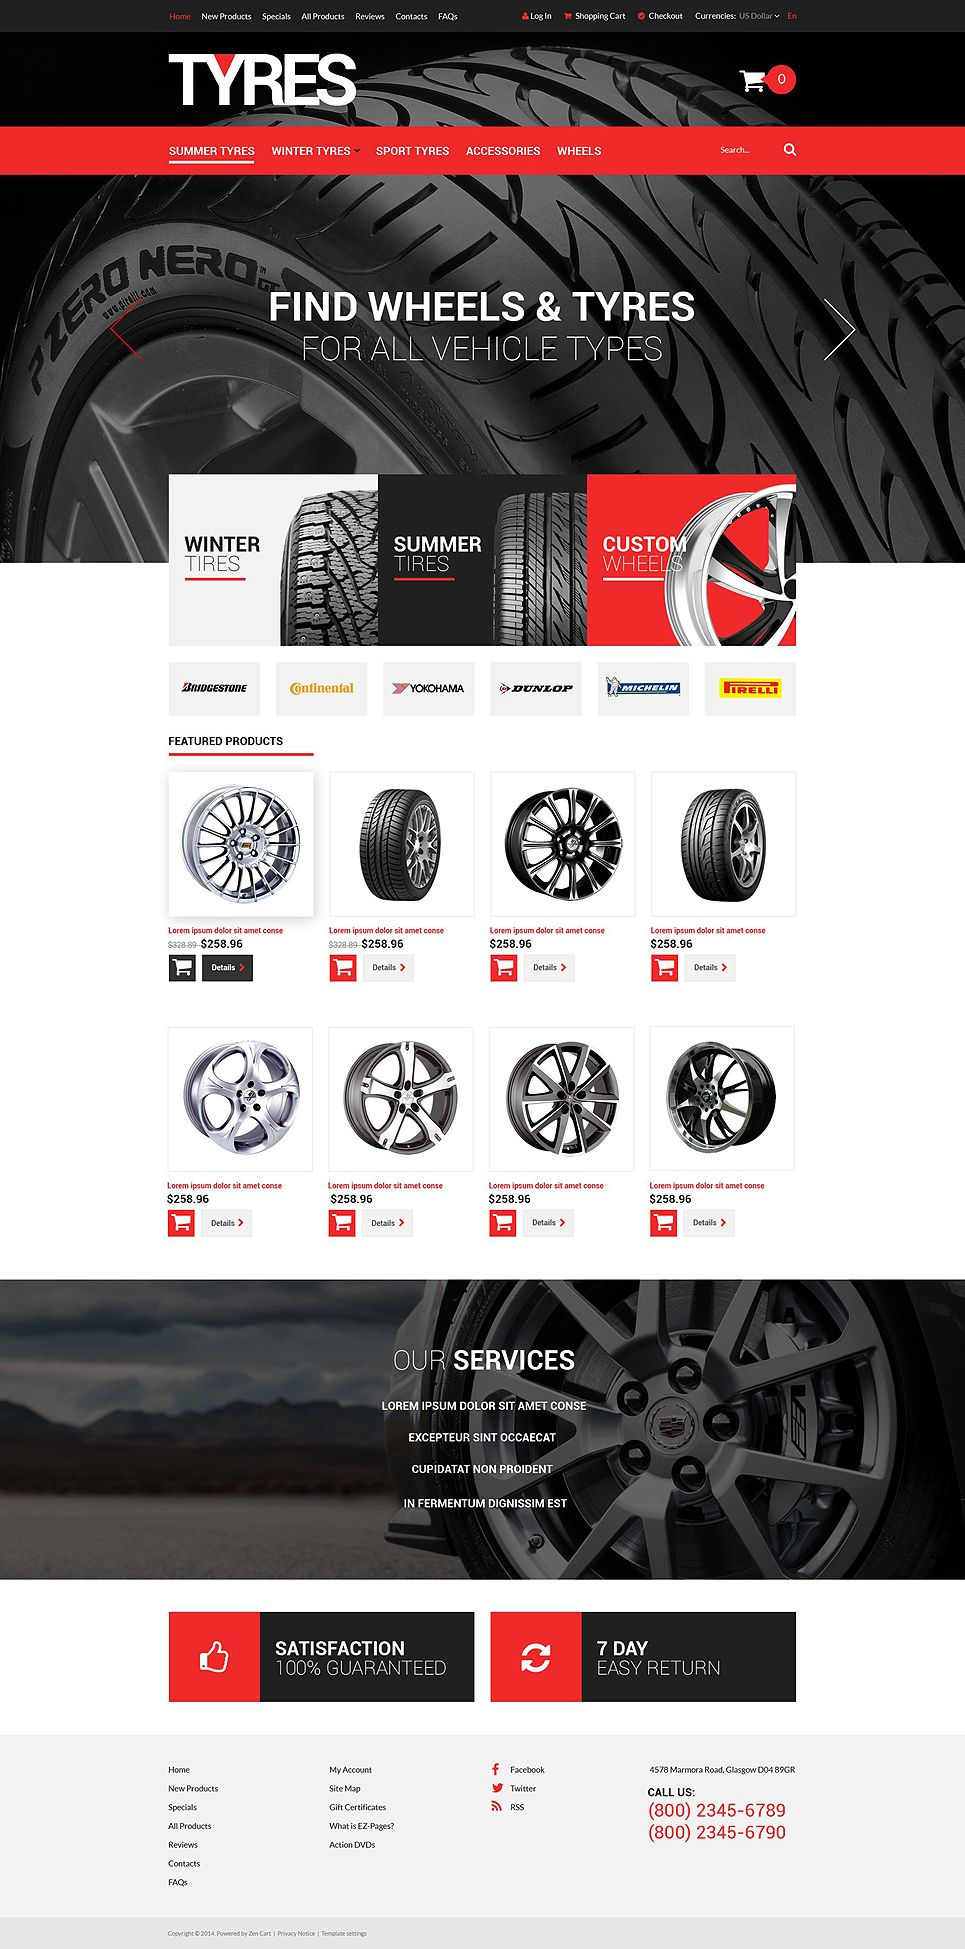 Online Tire Sales >> Online Tires Sales Zencart Template Design To Draw